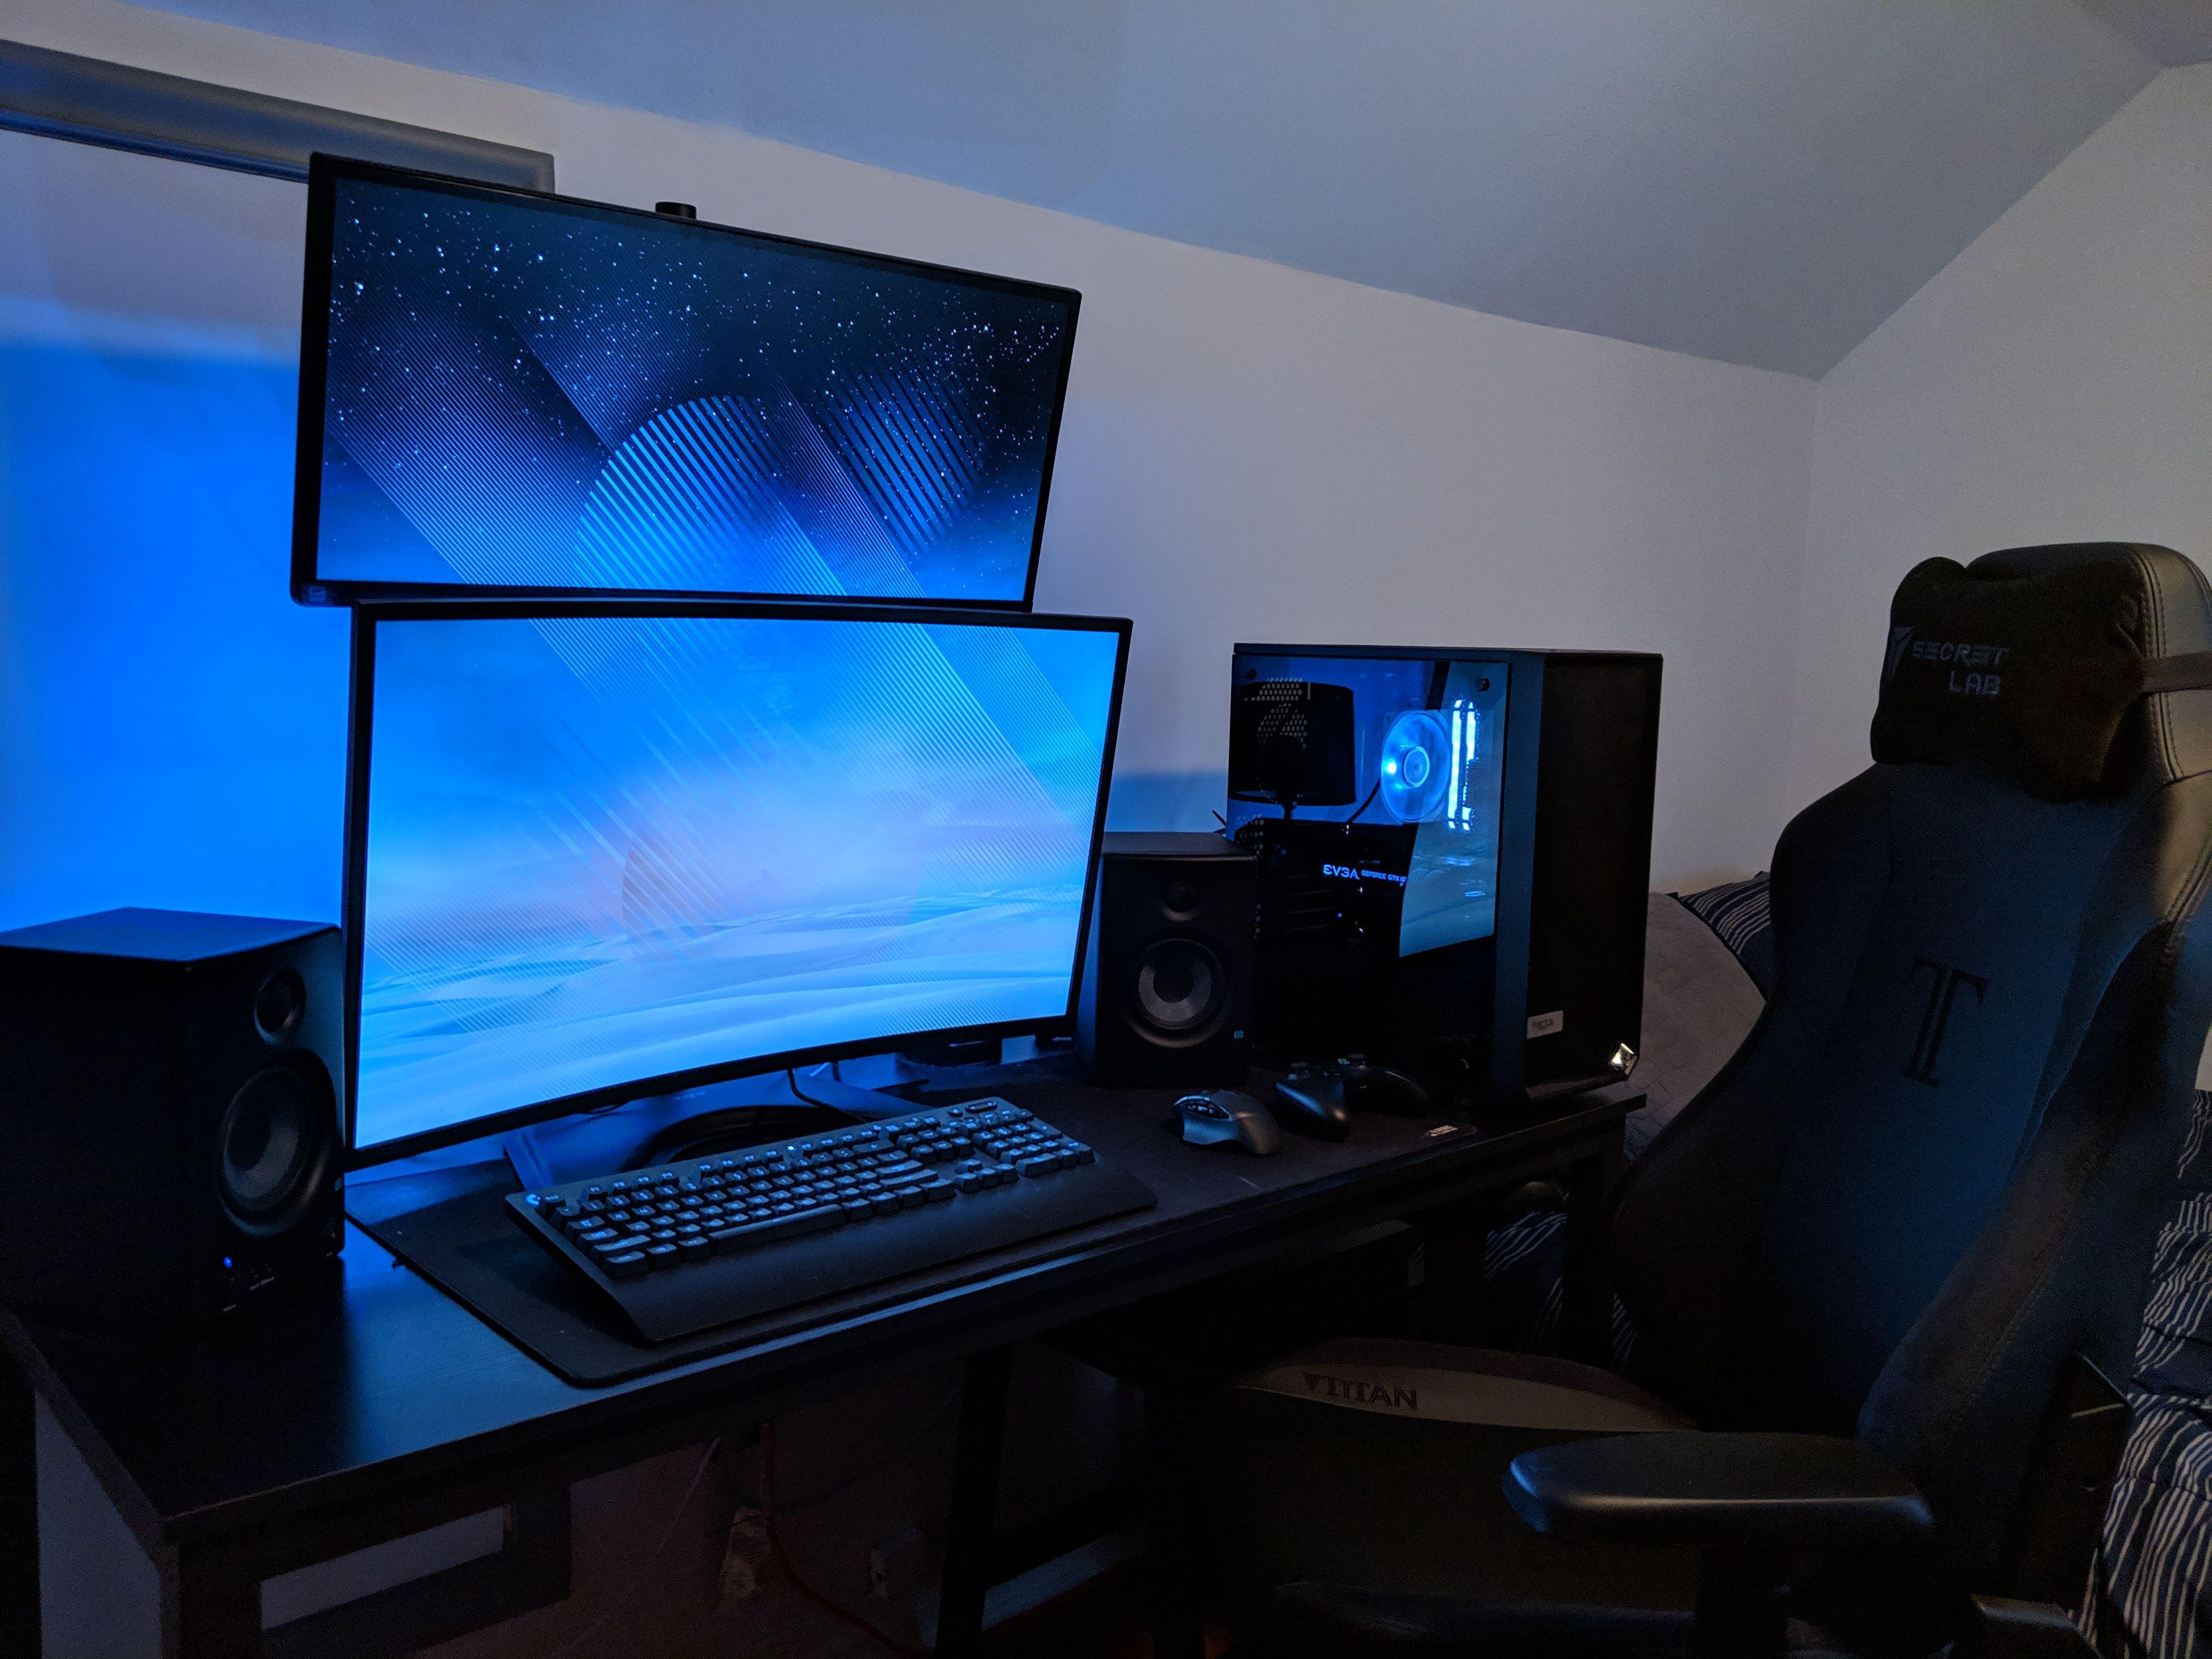 Vertical Stacked Dual Monitor Wallpaper Nosirix